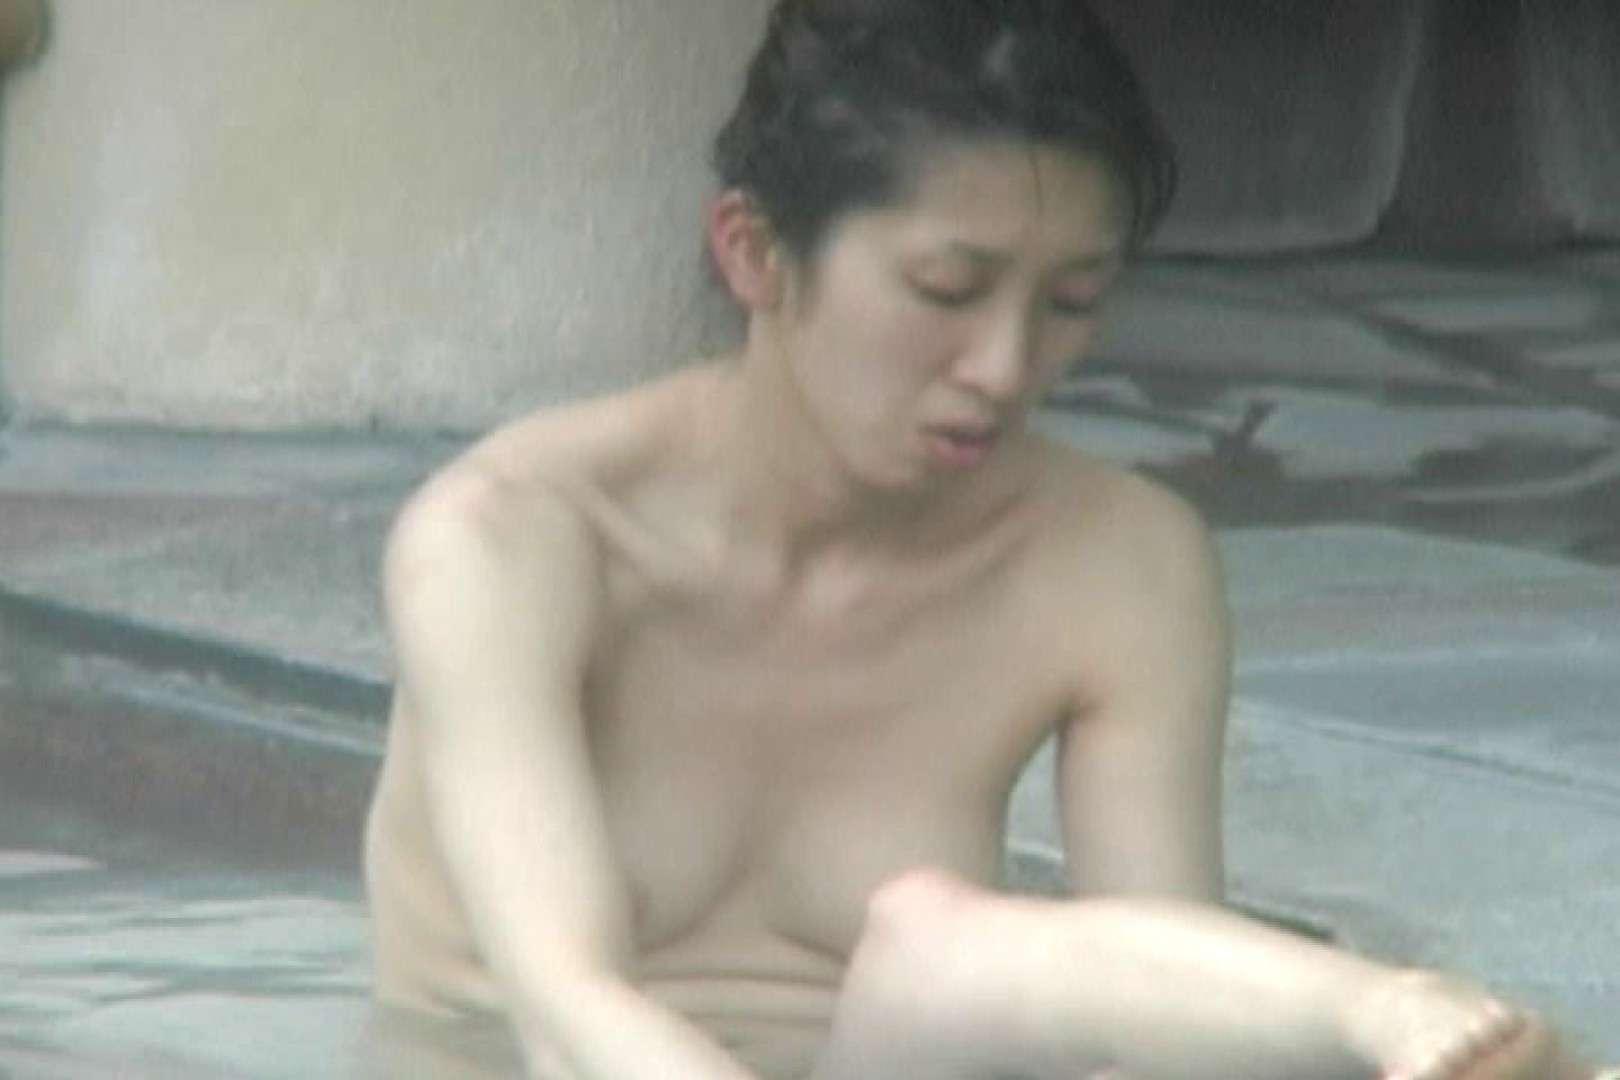 Aquaな露天風呂Vol.588 0   0  41連発 41